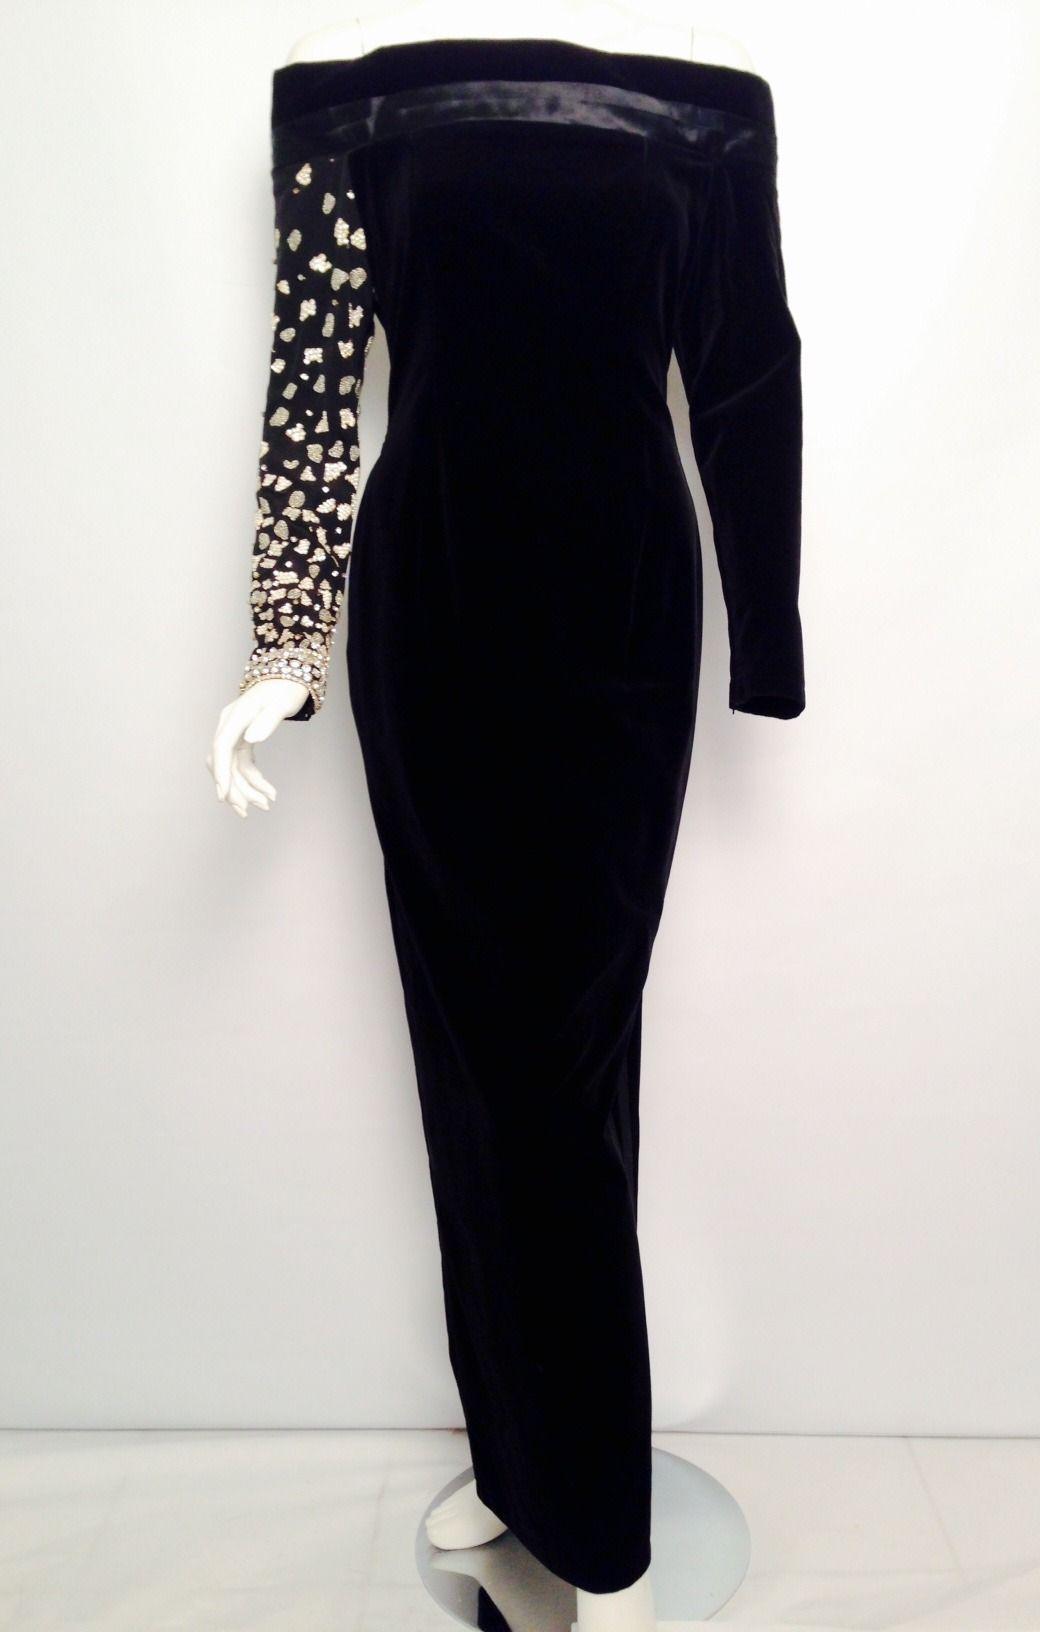 Vintage embroidered gianni versace long sleeve black velvet sheath